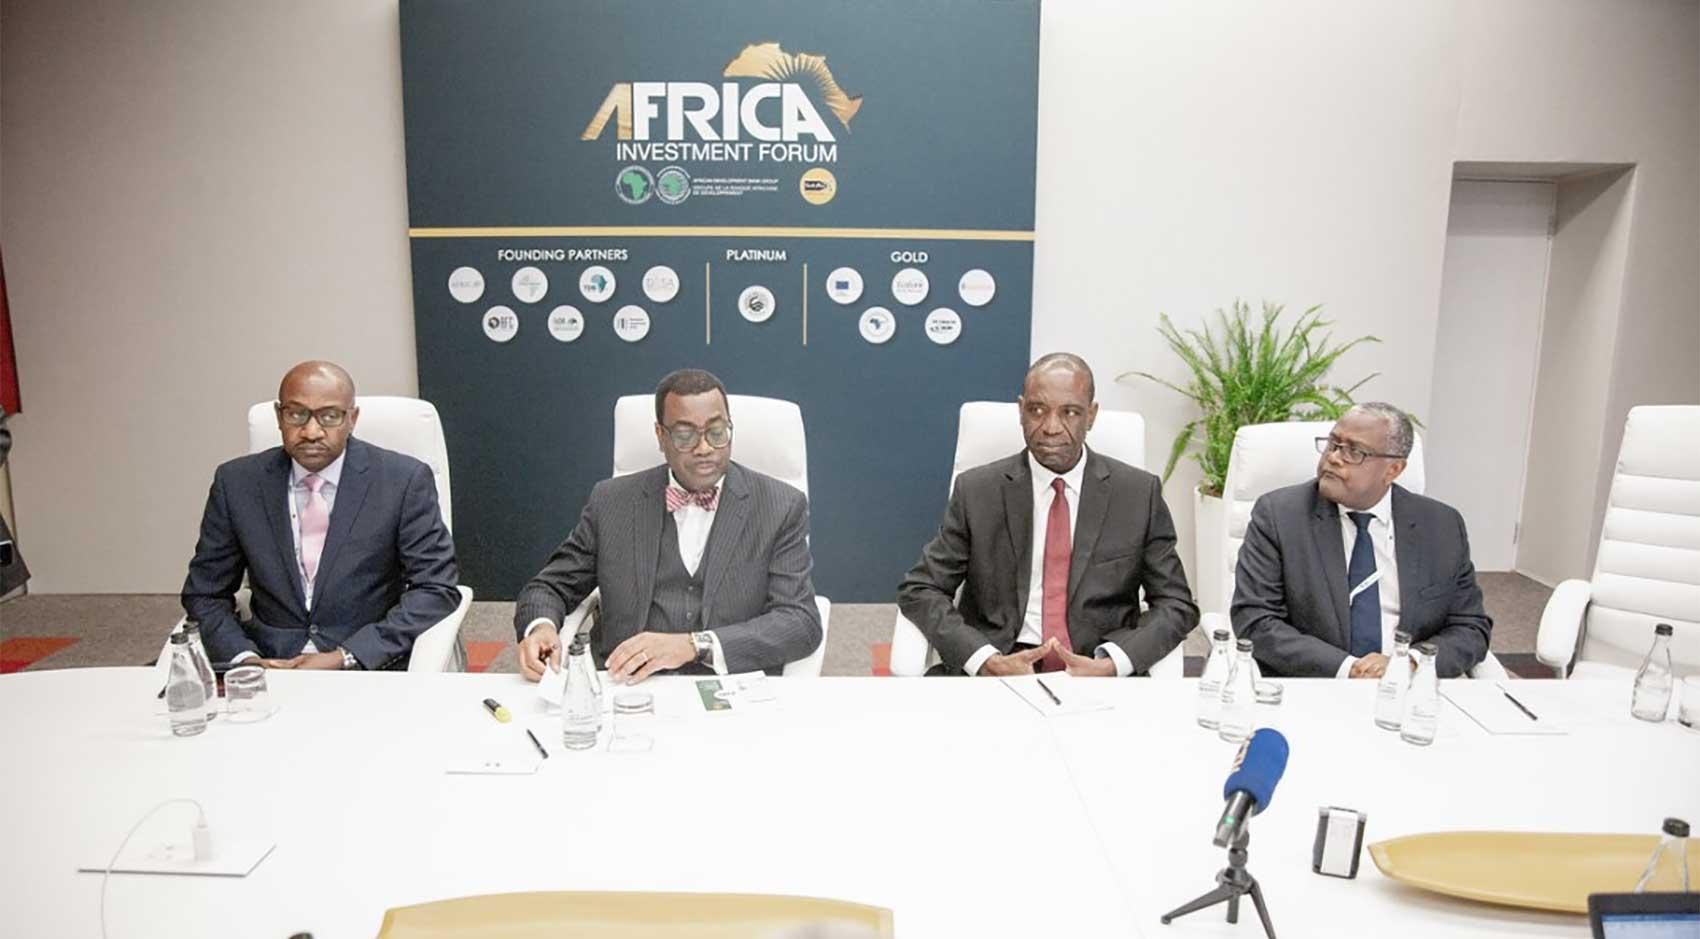 Libya africa investment portfolio mauritius eileen fisher puffer vest nylon